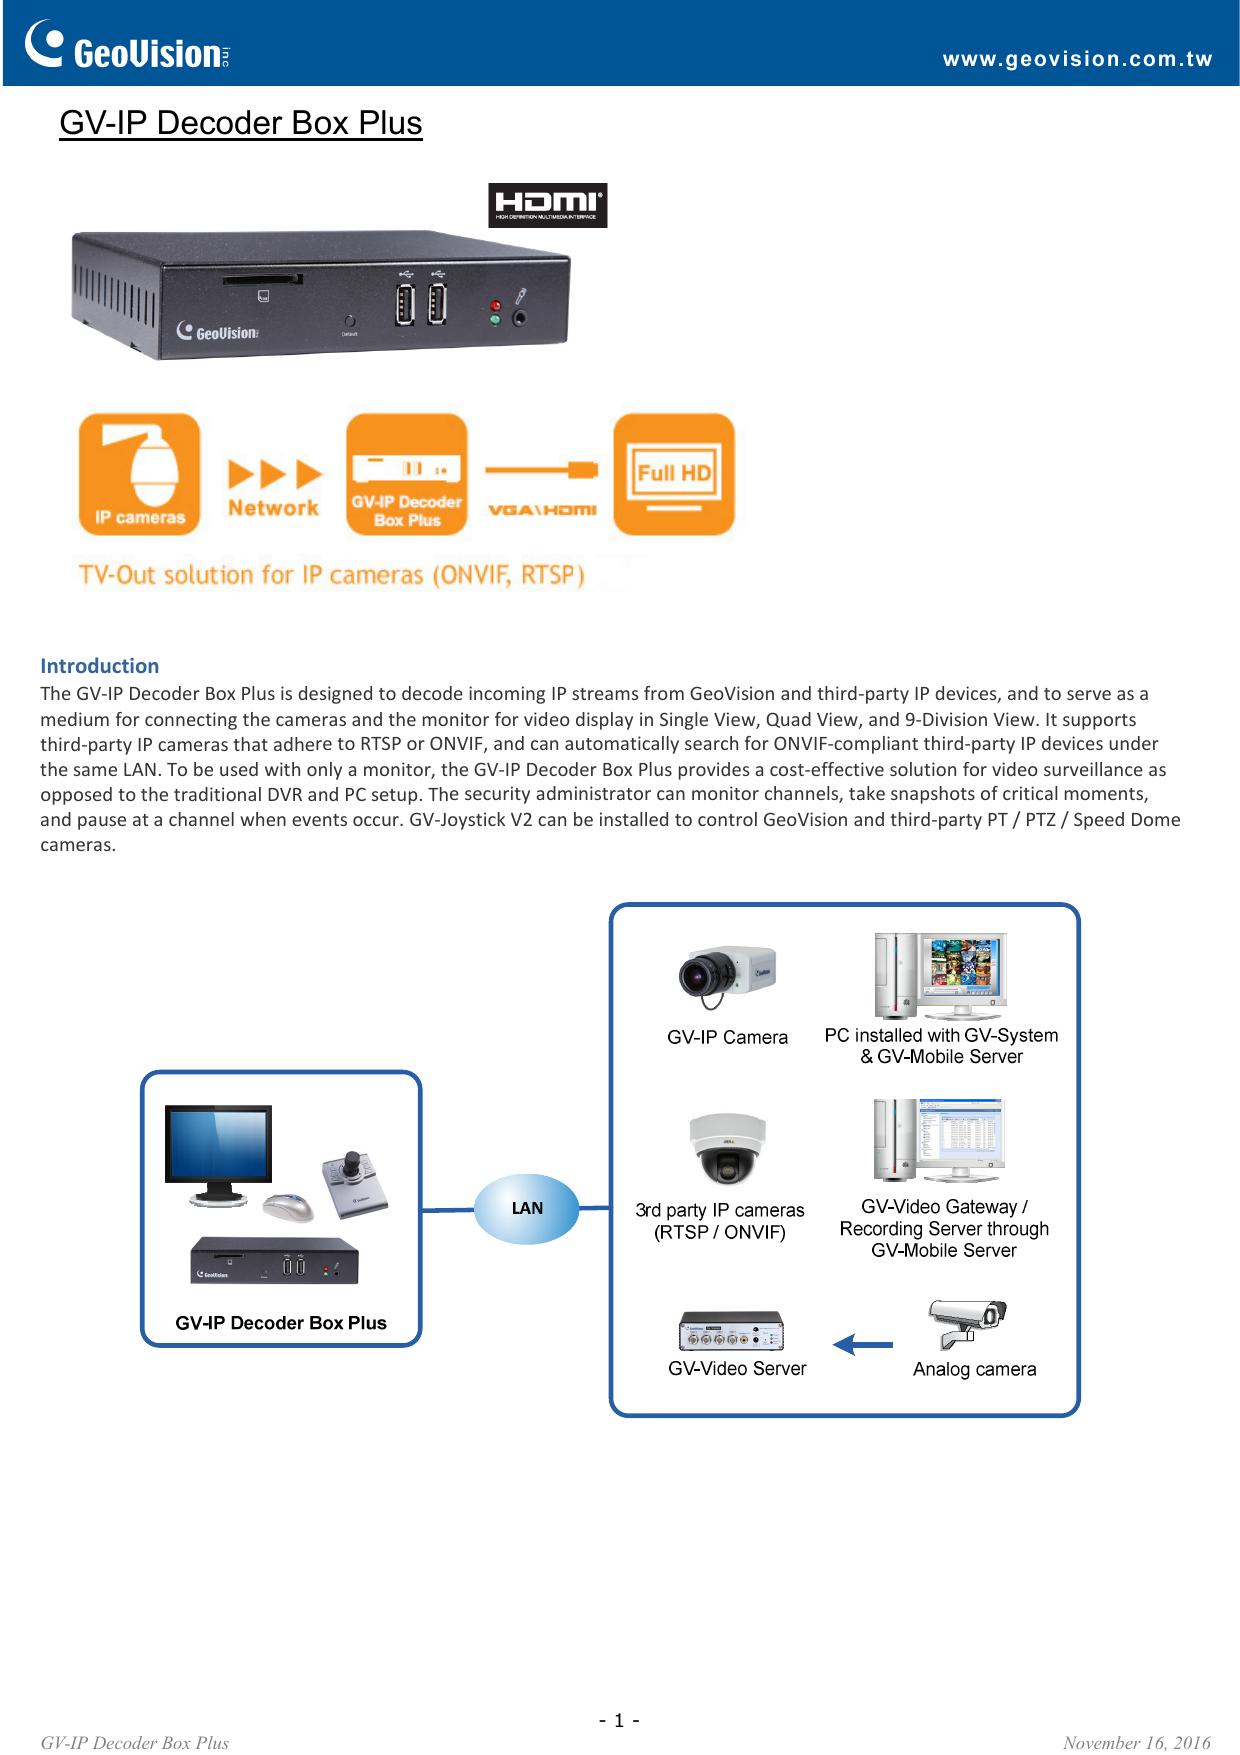 GV-IP Decoder Box Plus | manualzz com